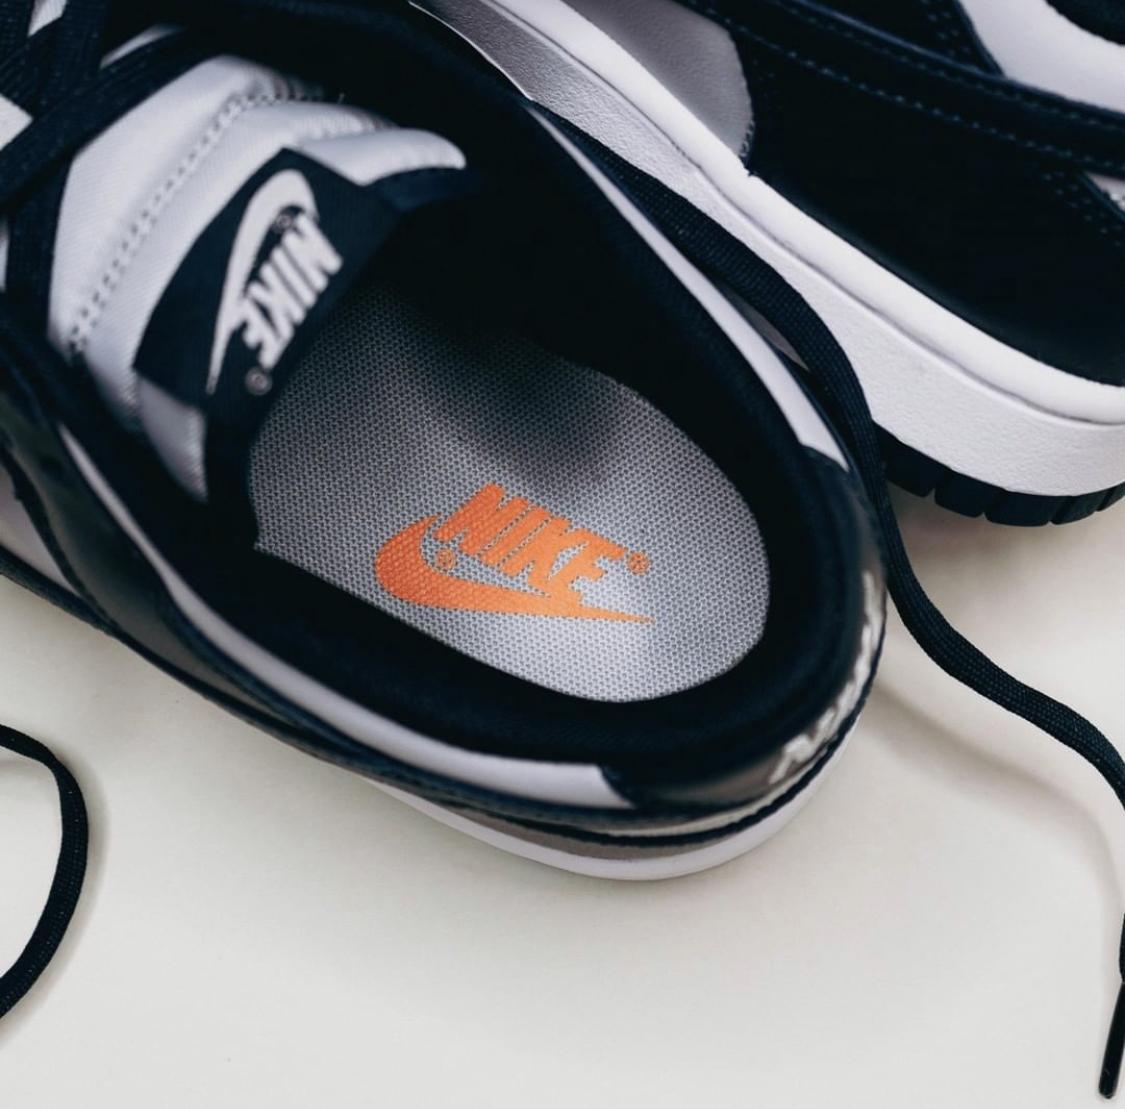 Nike Dunk Low Georgetown (Championship Grey) Arriving Stateside in November